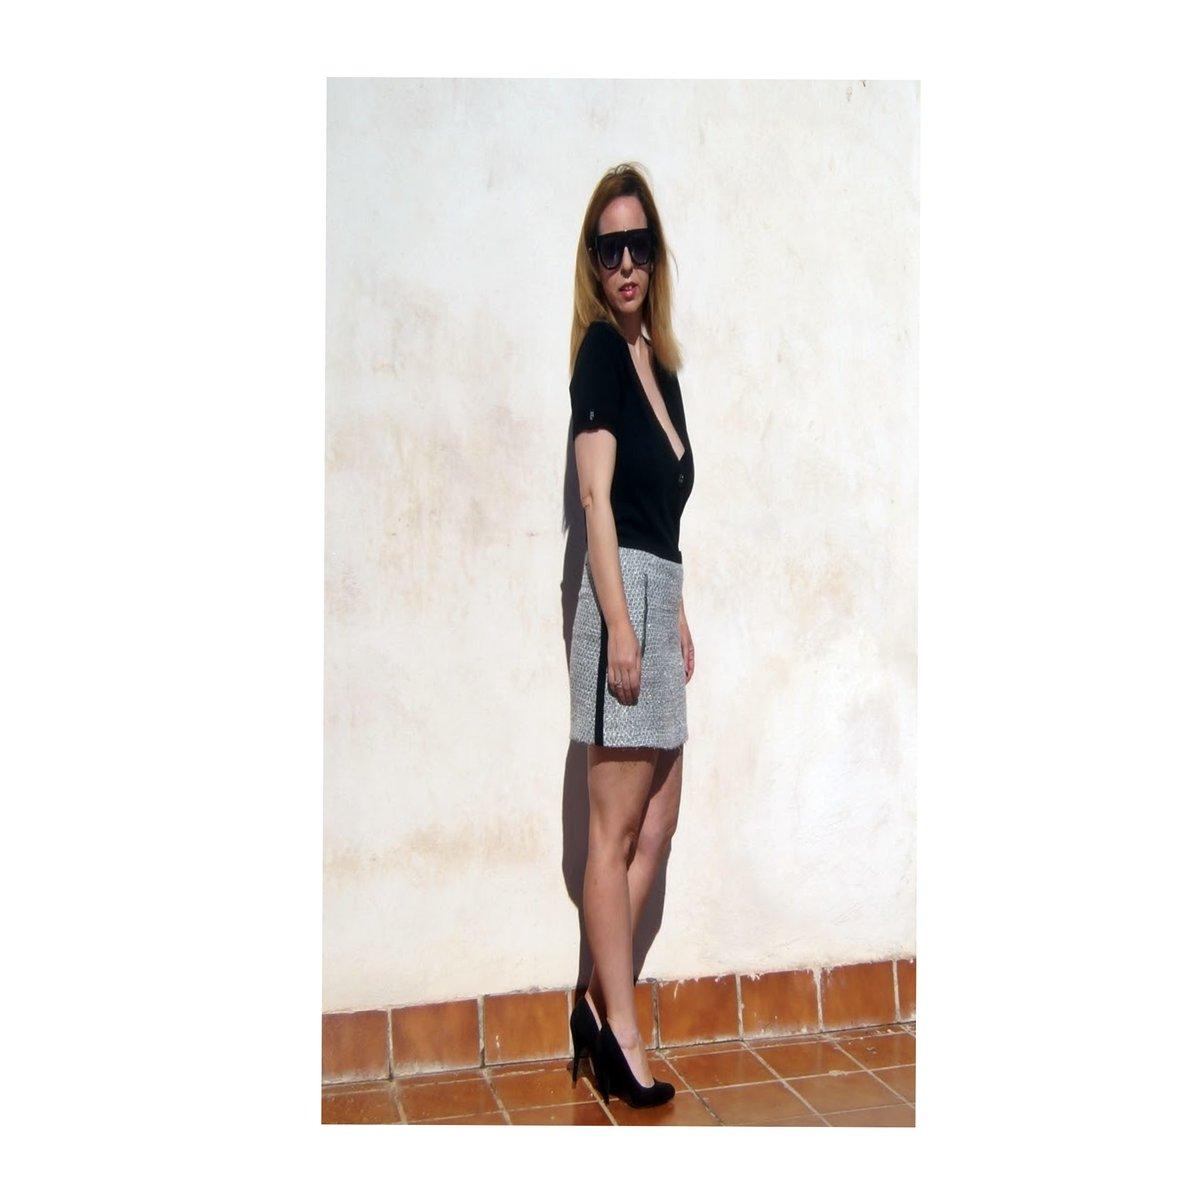 Hoy en el blog desafiando al otoño con minifalda y sin medidas. . .  . . #ootd #newpost #outfitoftheday #outfit #streetstyle #minifalda #lookoftheday #bloggerstyle #blogger #blog #hipster #igdaily #iphonesia #cute #l4l  #fashion  #casual #casualstyle